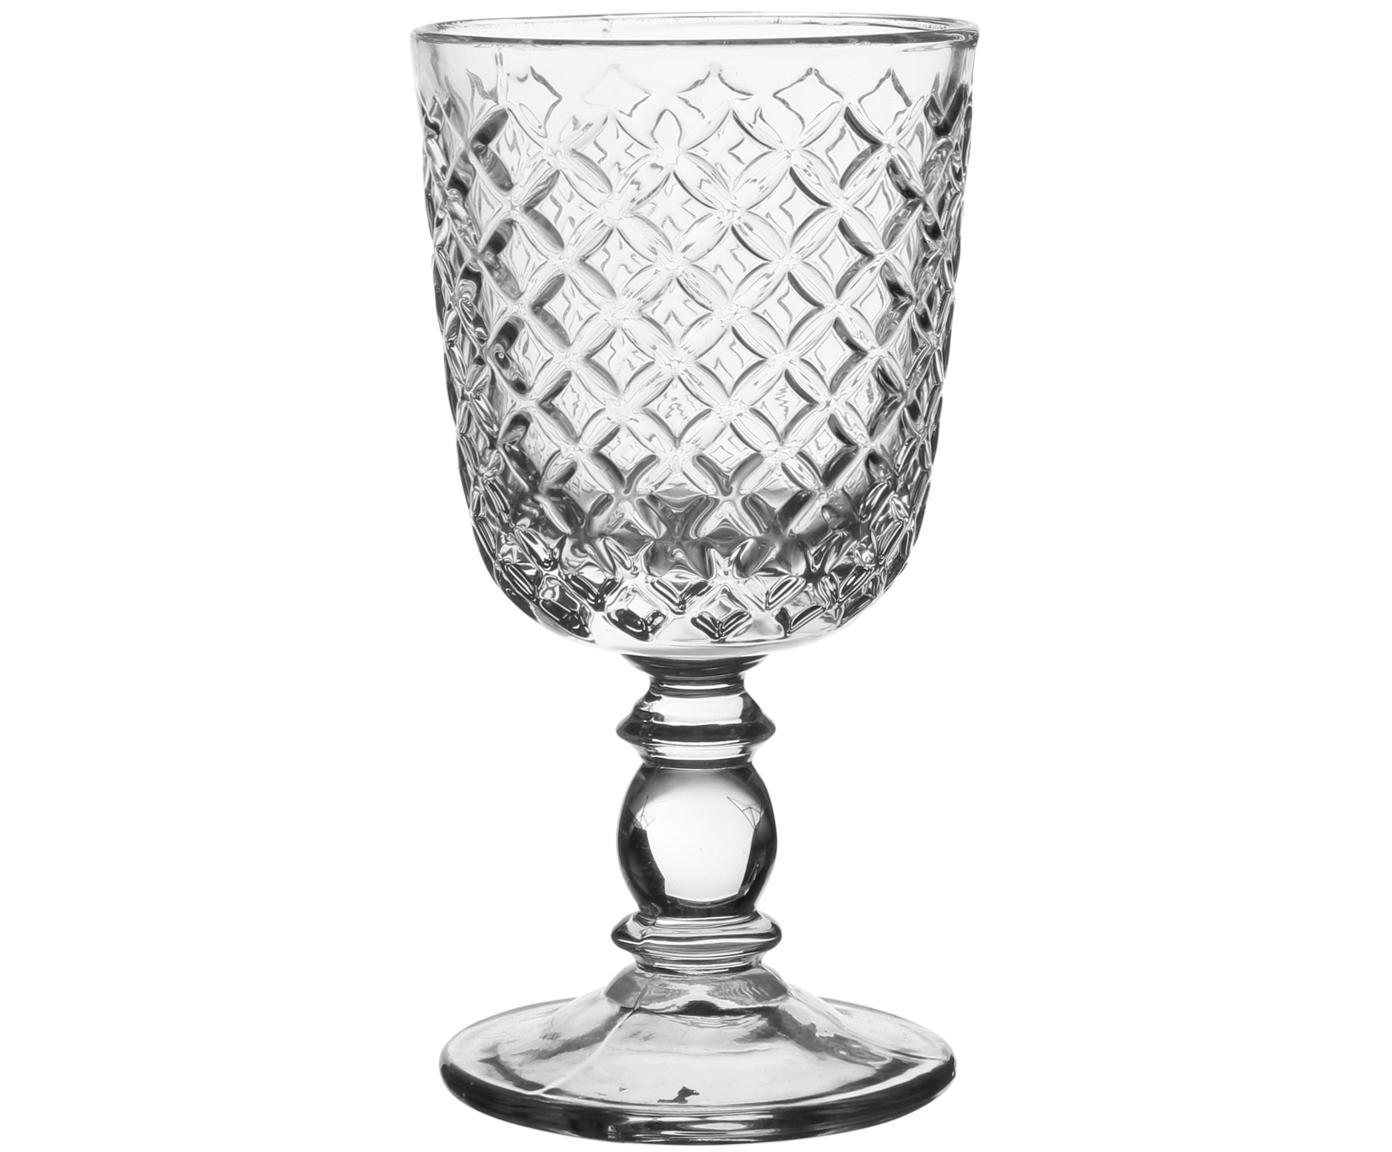 Bicchiere Arlequin 2 pz, Vetro, Trasparente, 280 ml